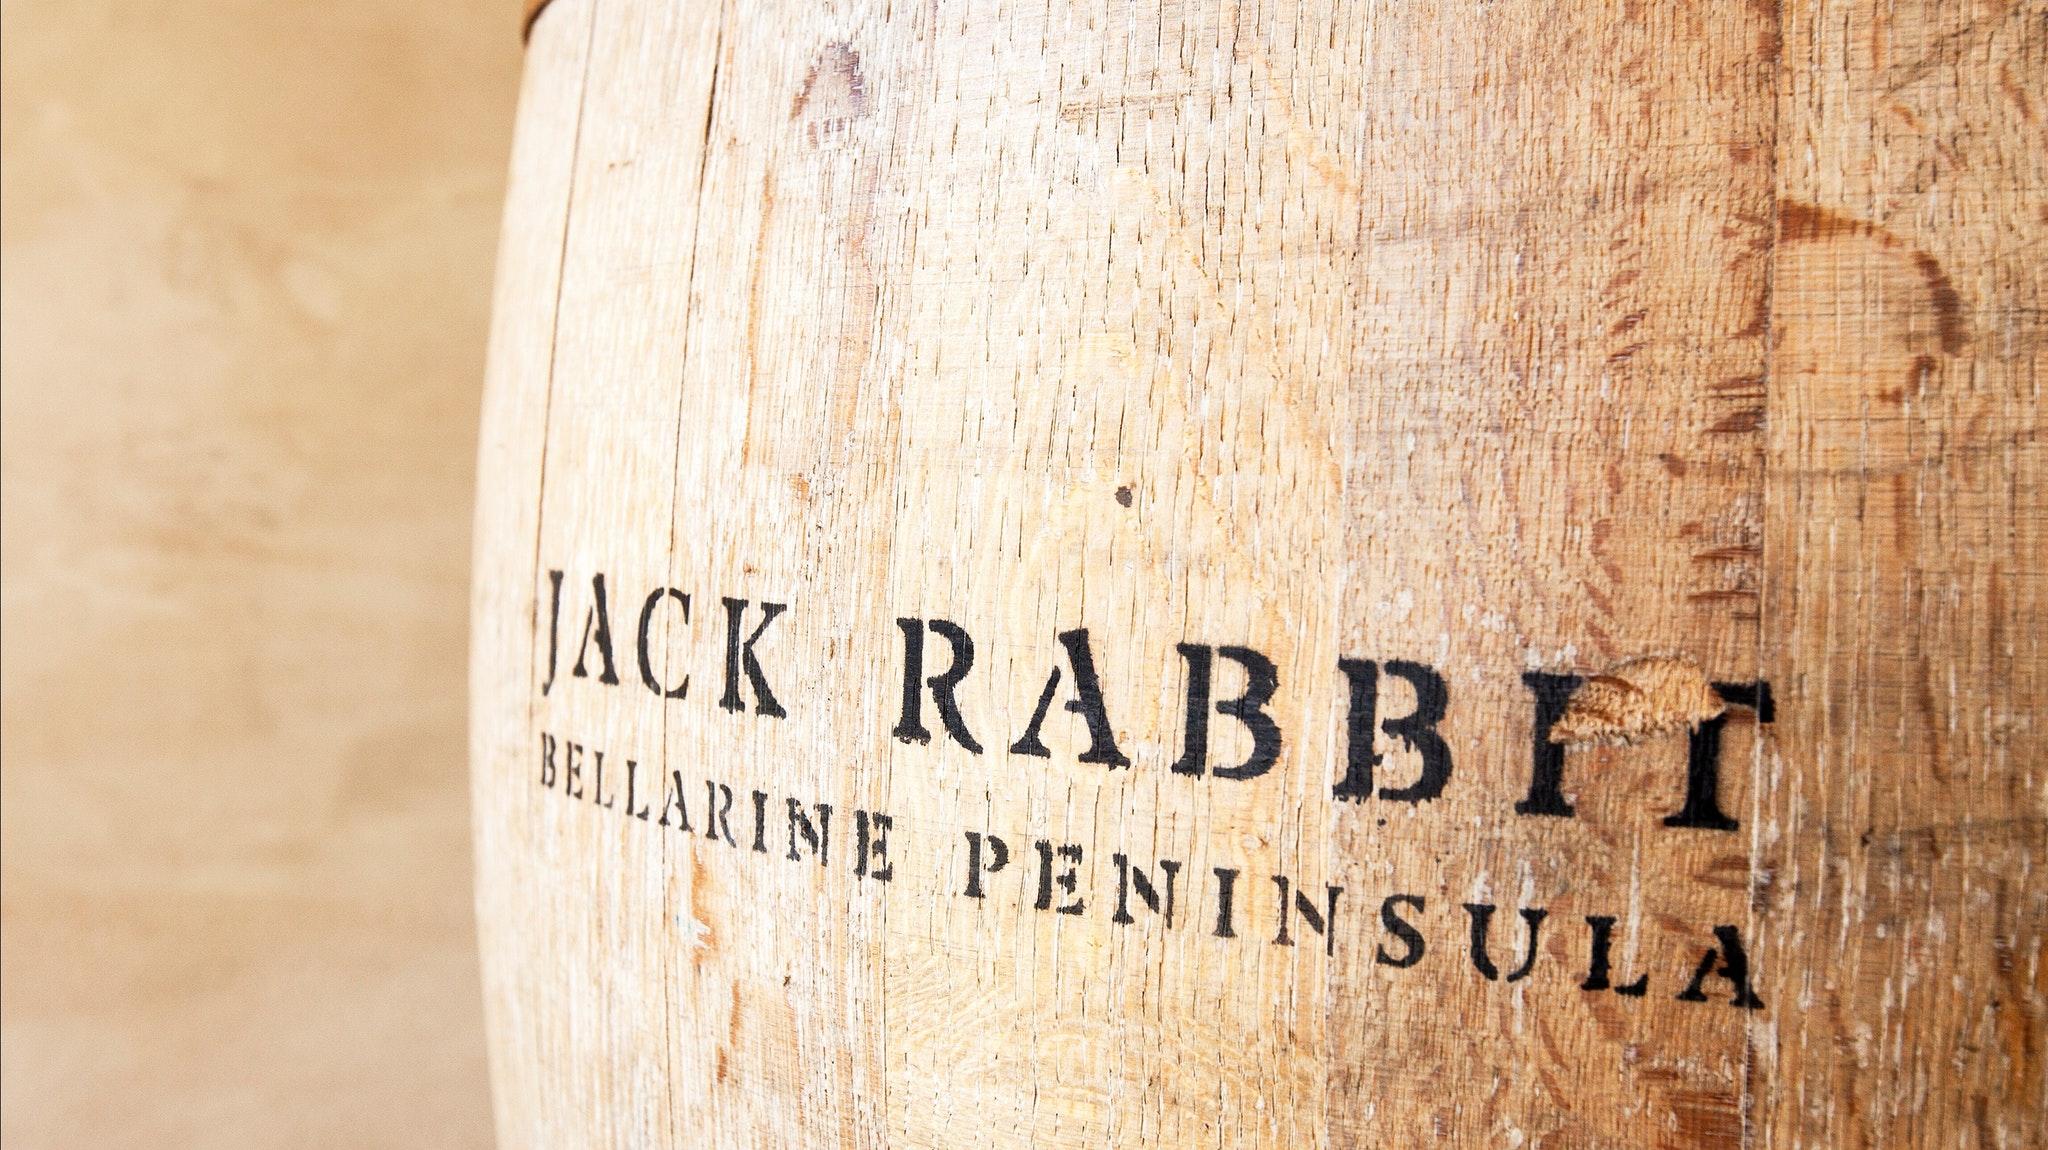 Jack Rabbit Vineyard